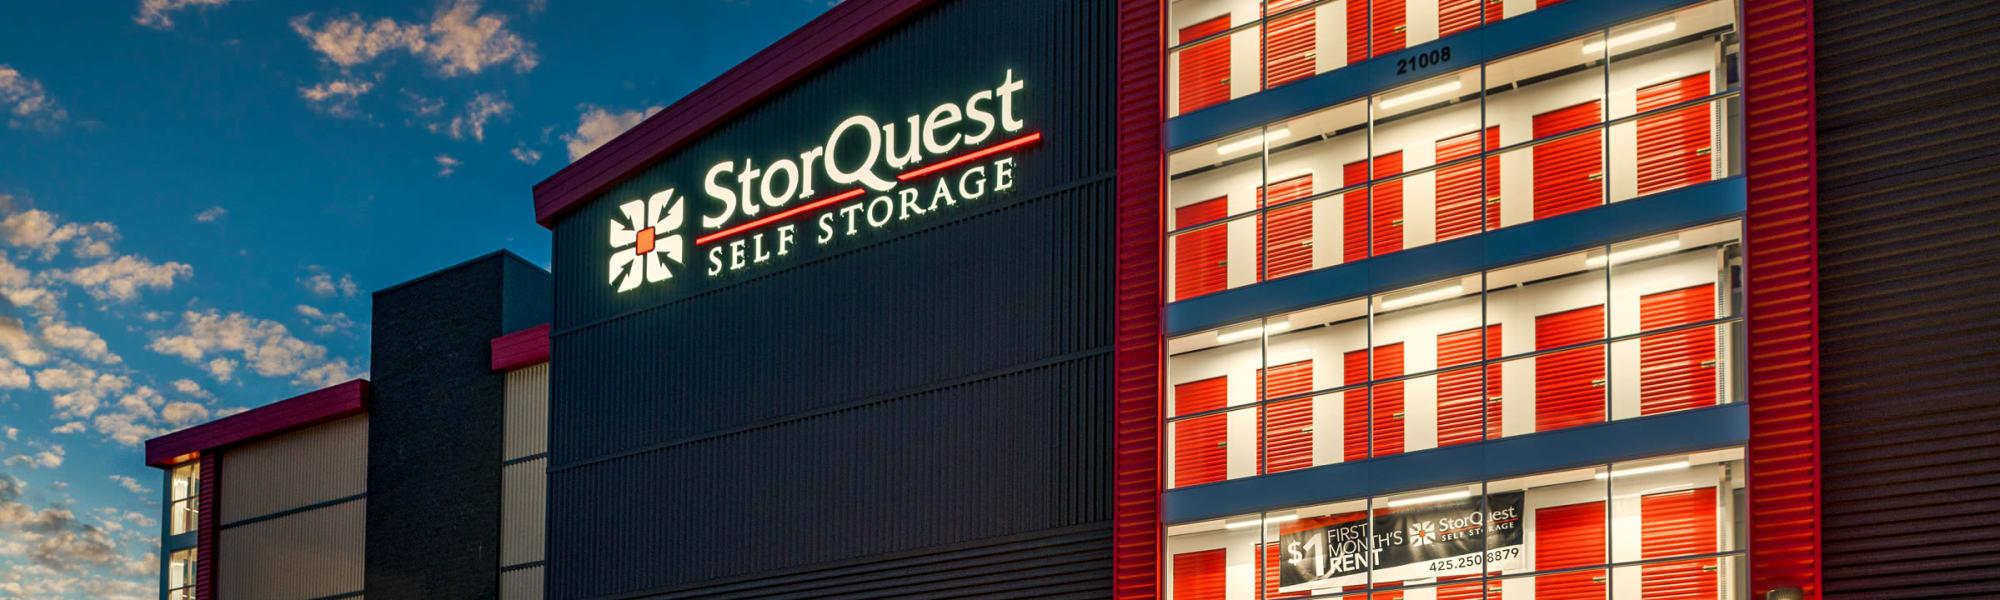 StorQuest Self Storage in Bothell, Washington